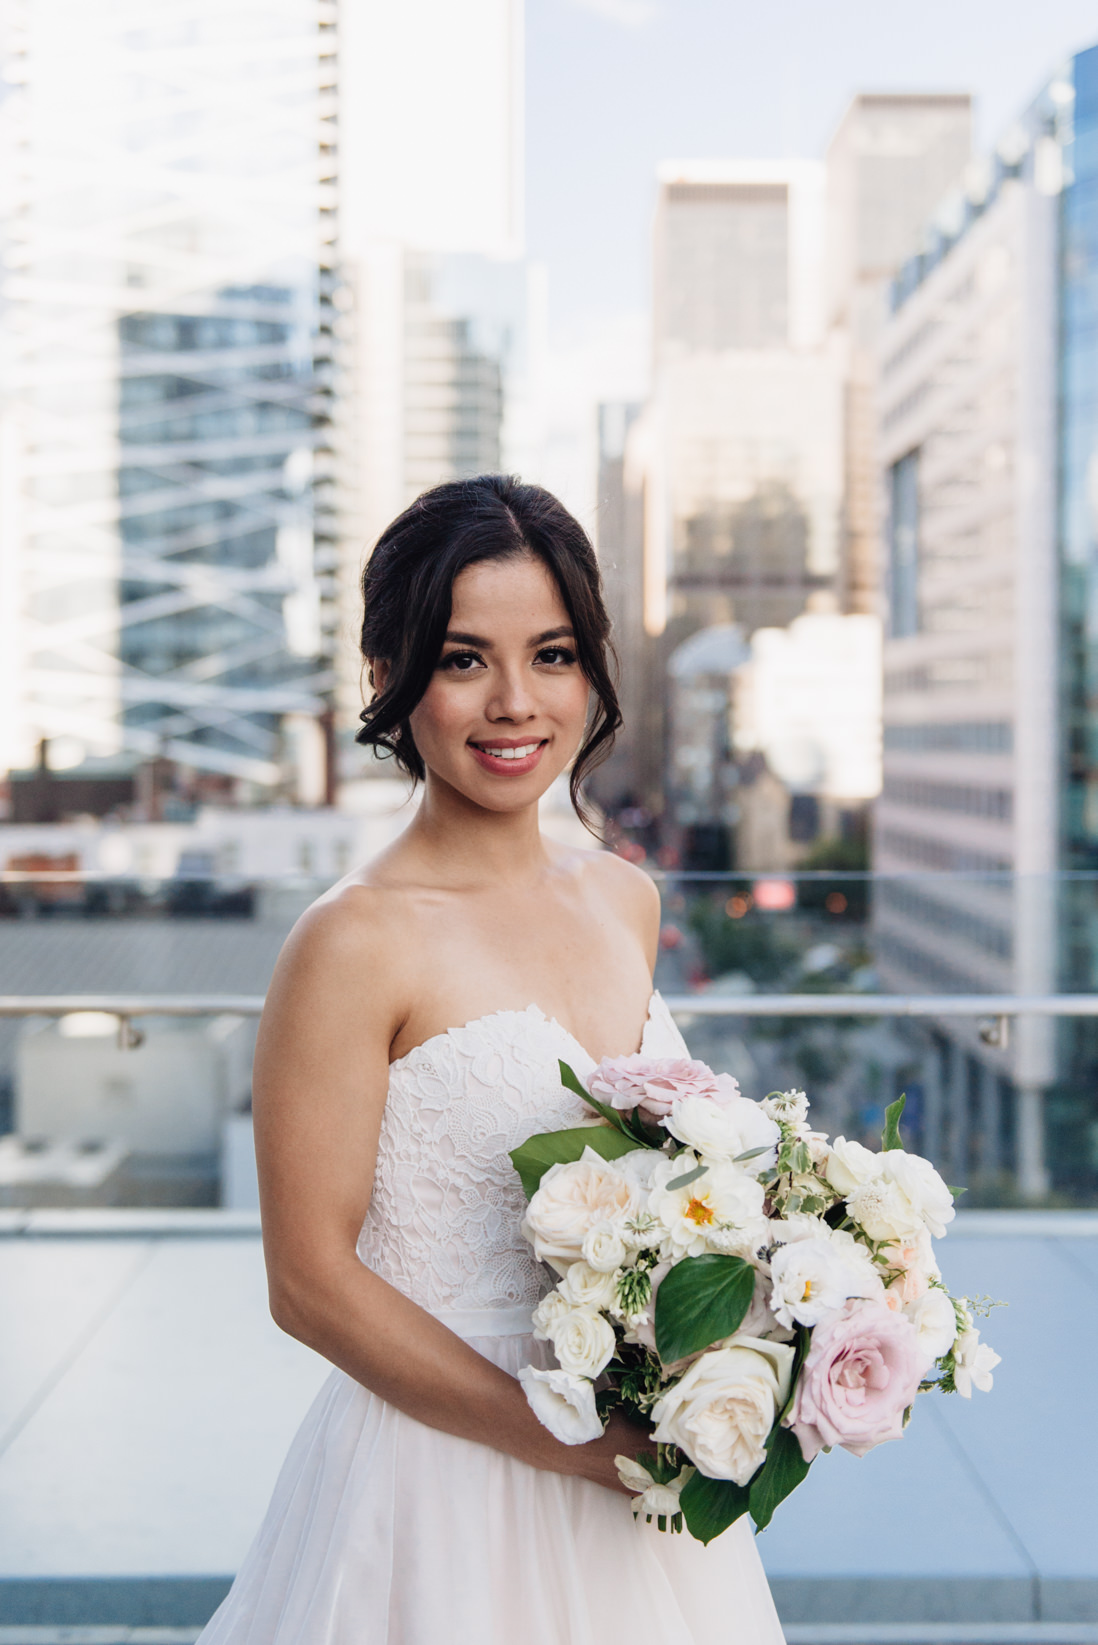 essense of australia dress bride with cream and blush bouquet_Malaparte_Wedding_Toronto_Wedding_Photographer | EightyFifth Street Photography